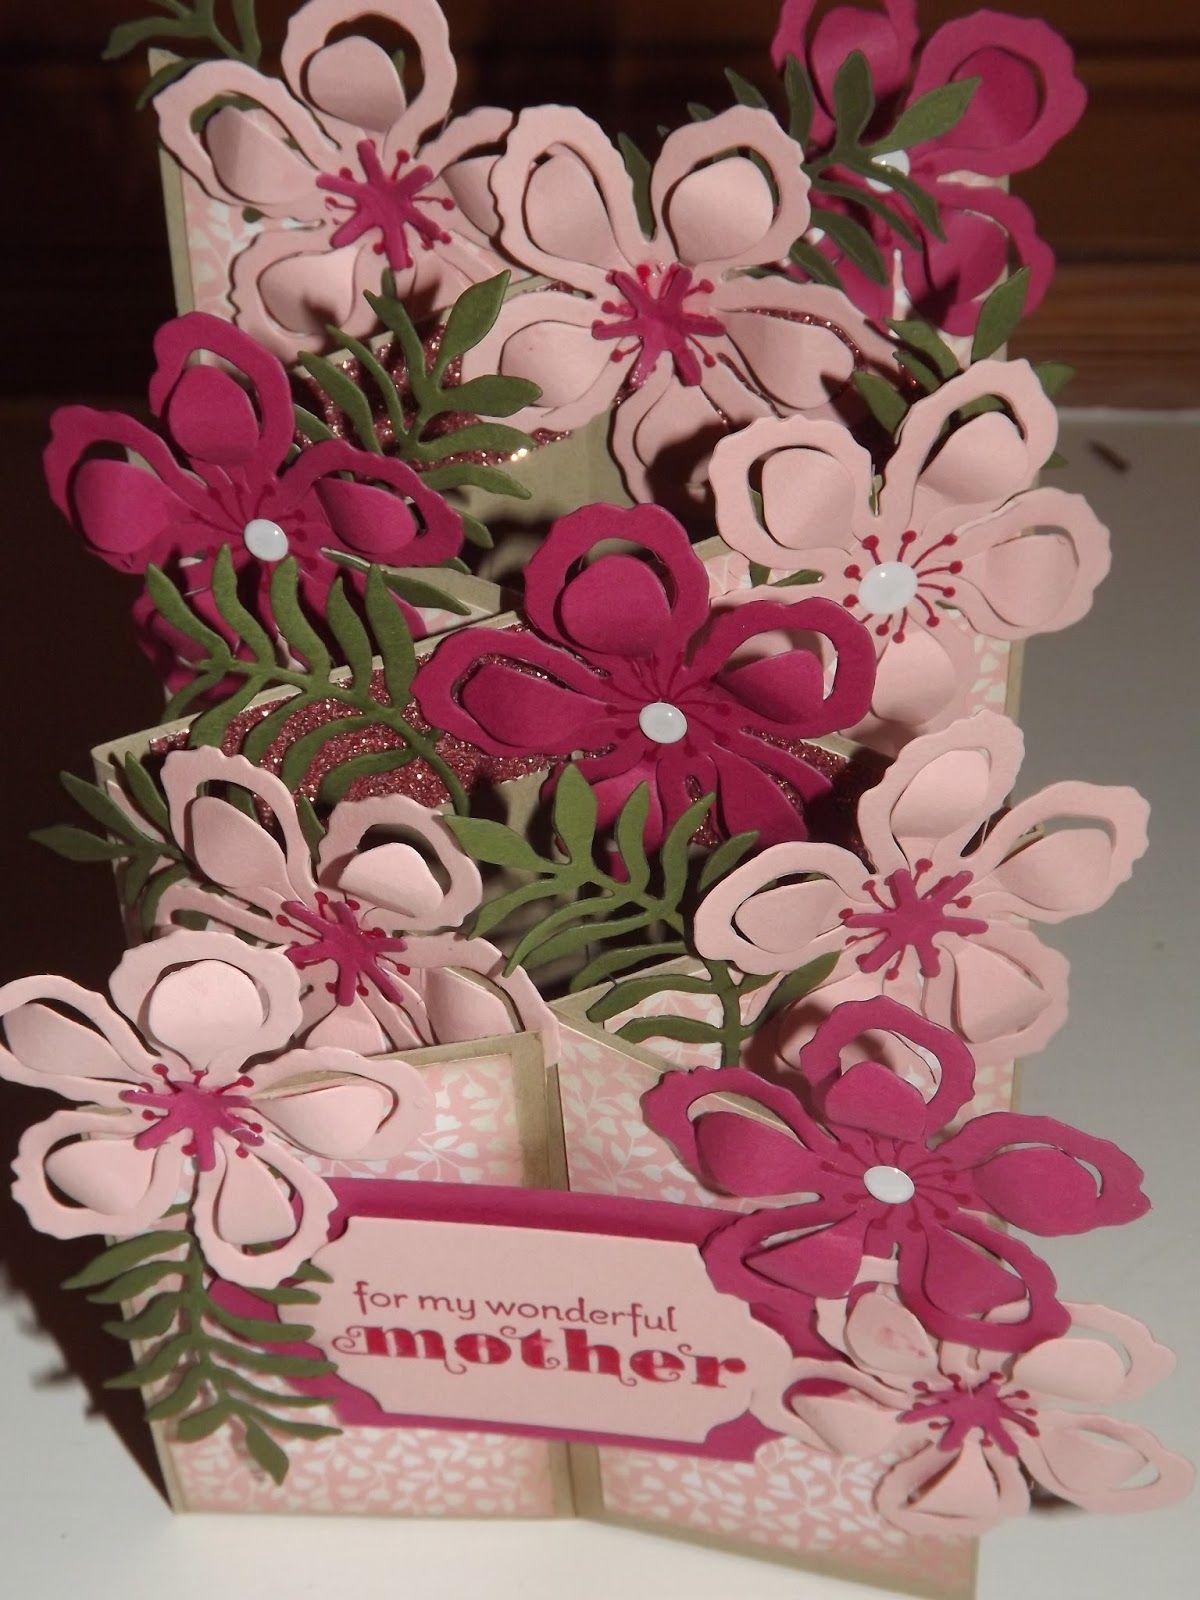 Kraftingk independent stampinuup demonstrator botanicals in pink